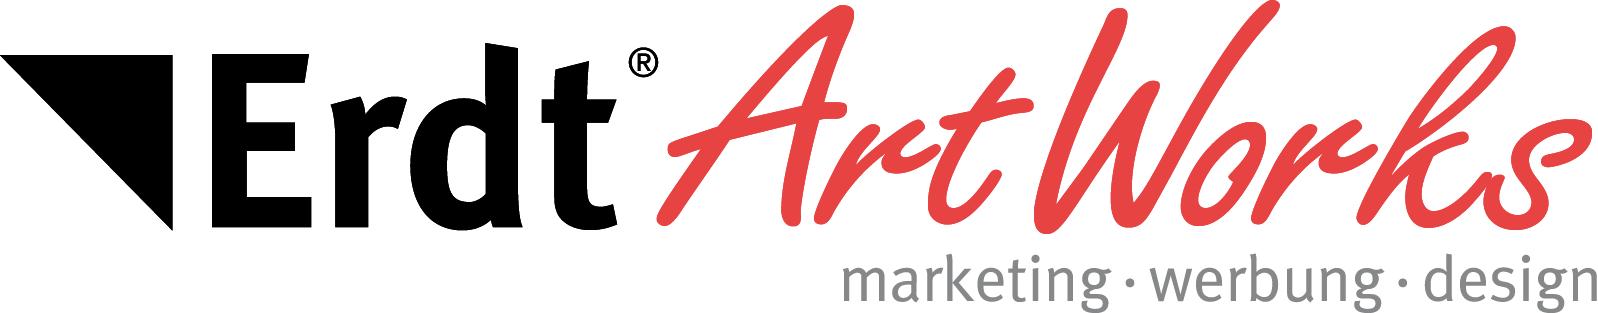 Erdt ArtWorks Werbeagentur Logo